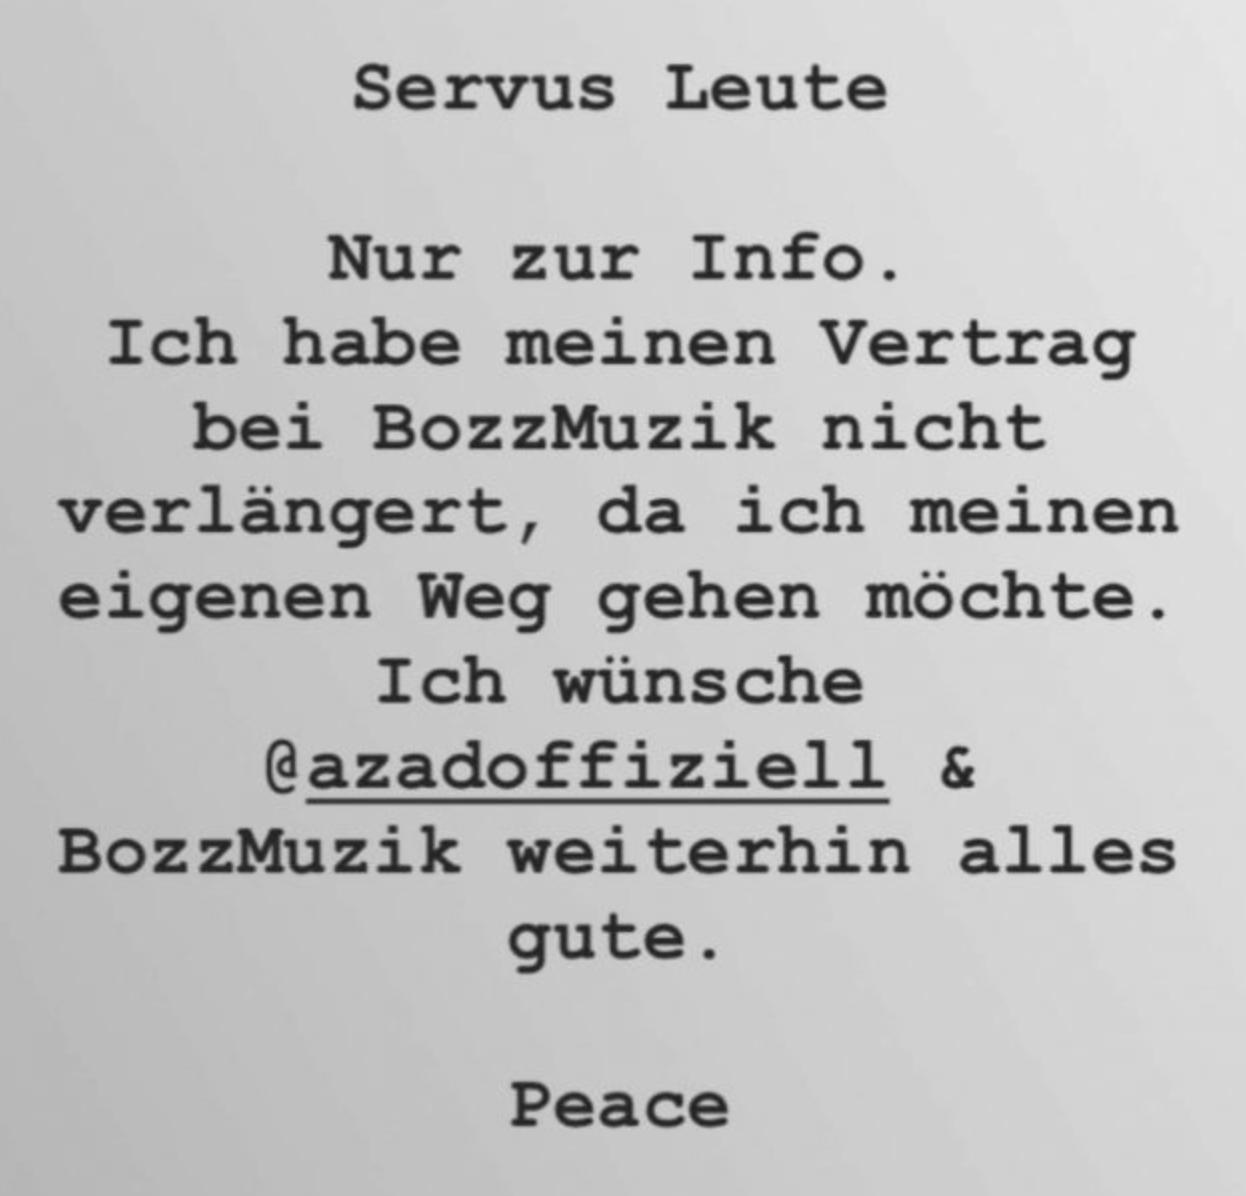 BozzMusik